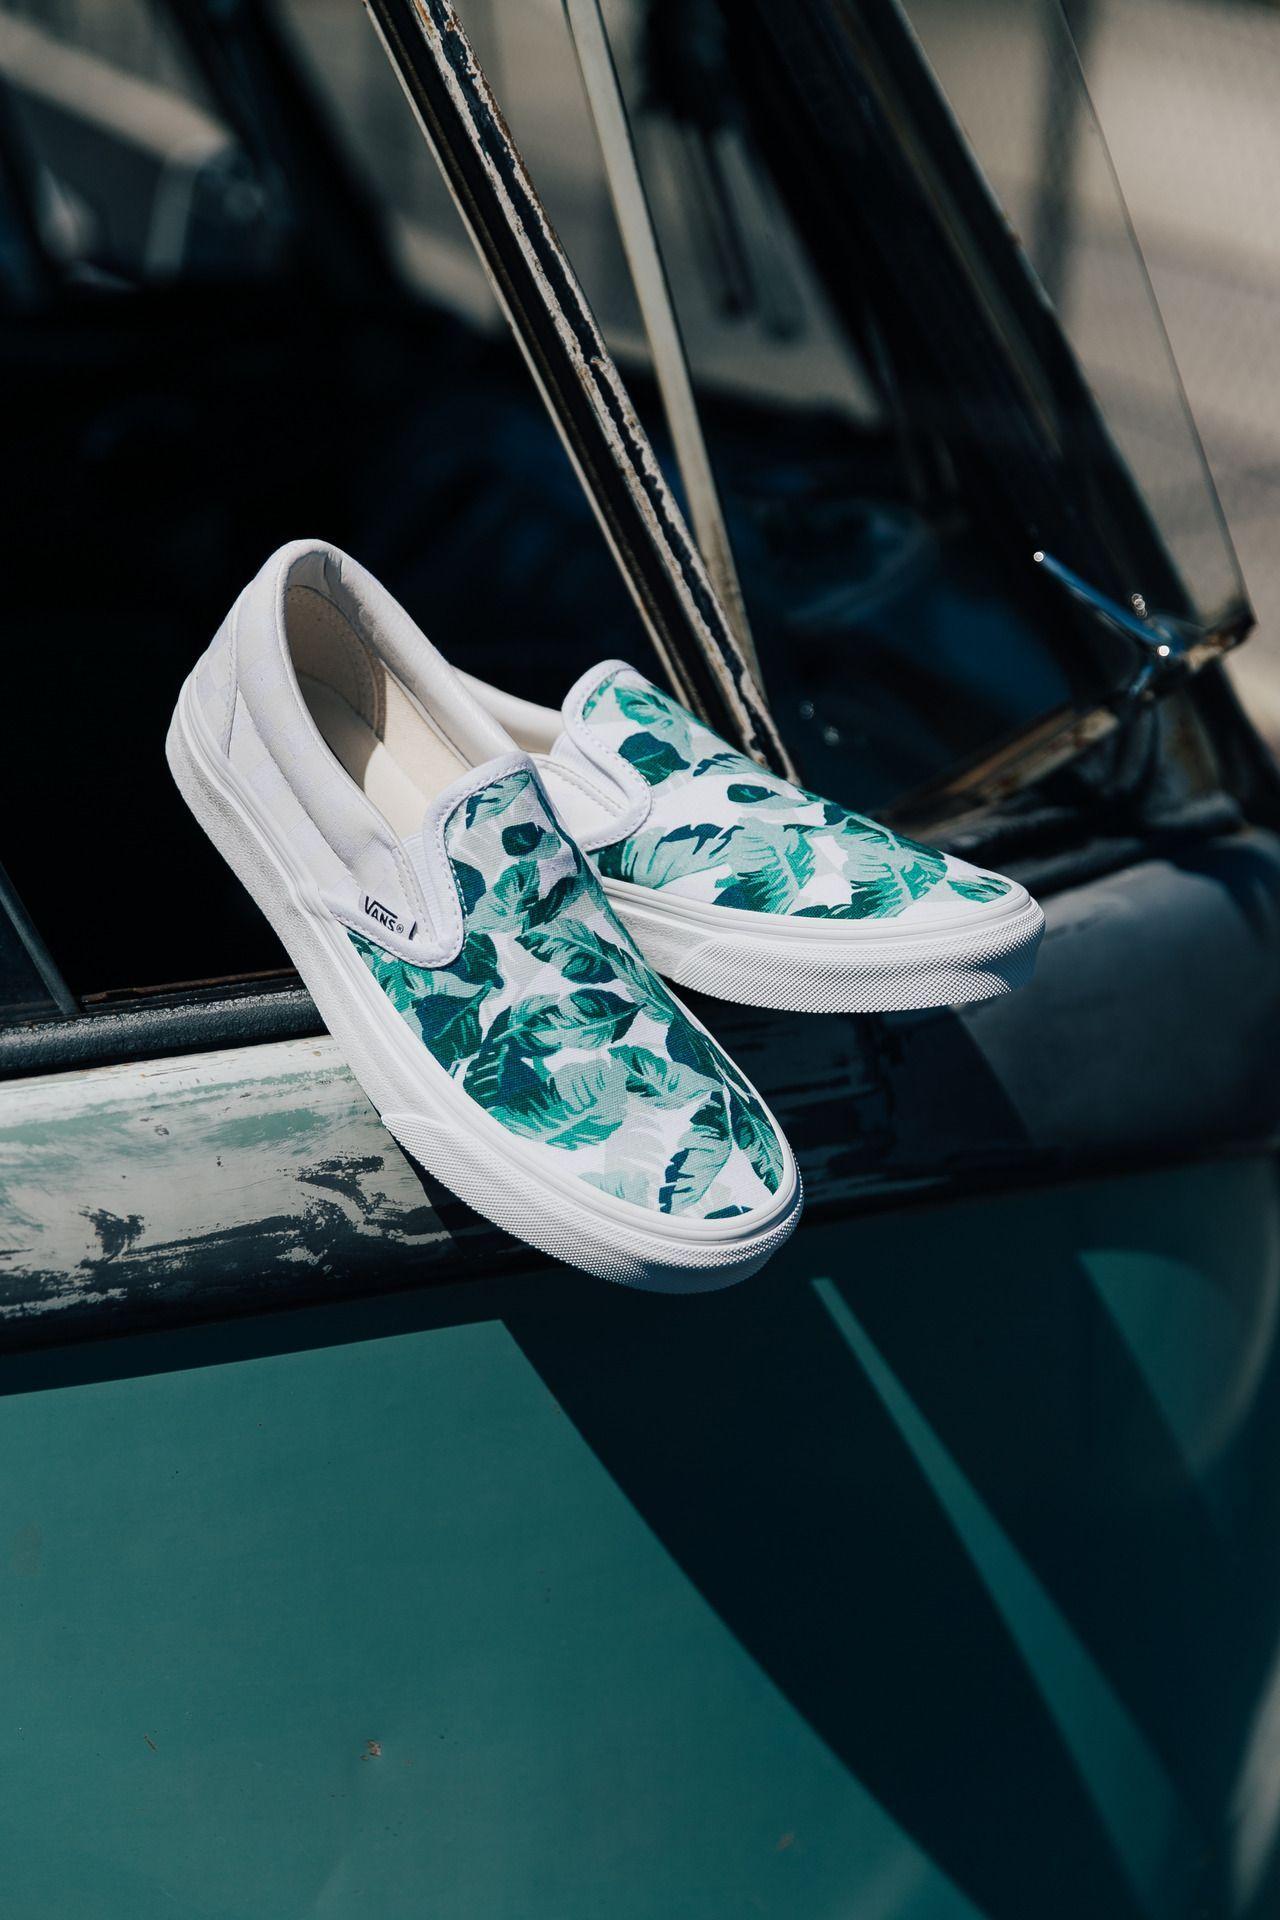 Custom vans shoes, Vans shoes